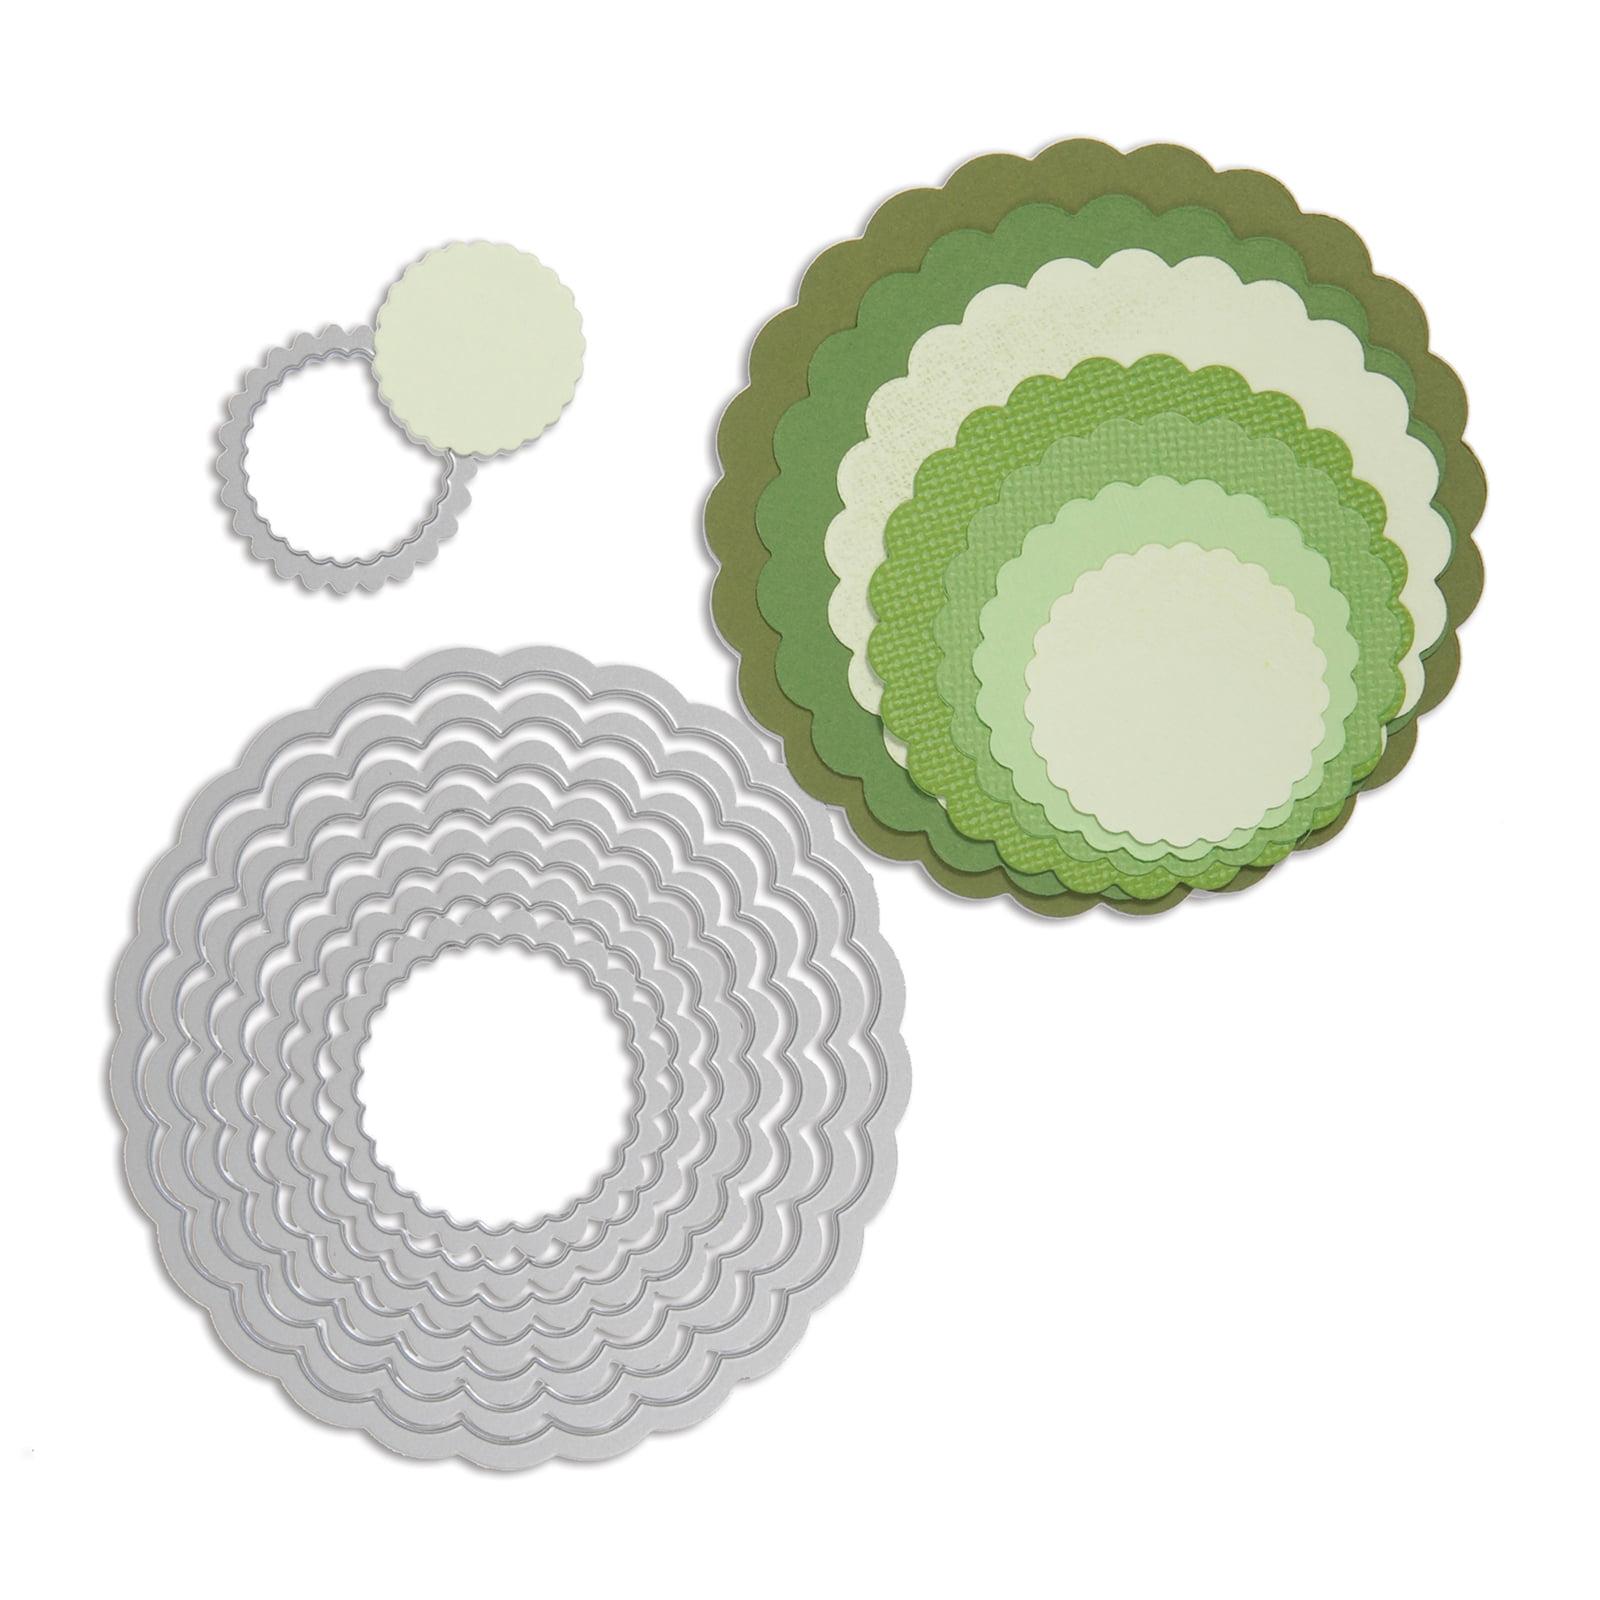 Sizzix Framelits Dies - Circles, Scallop